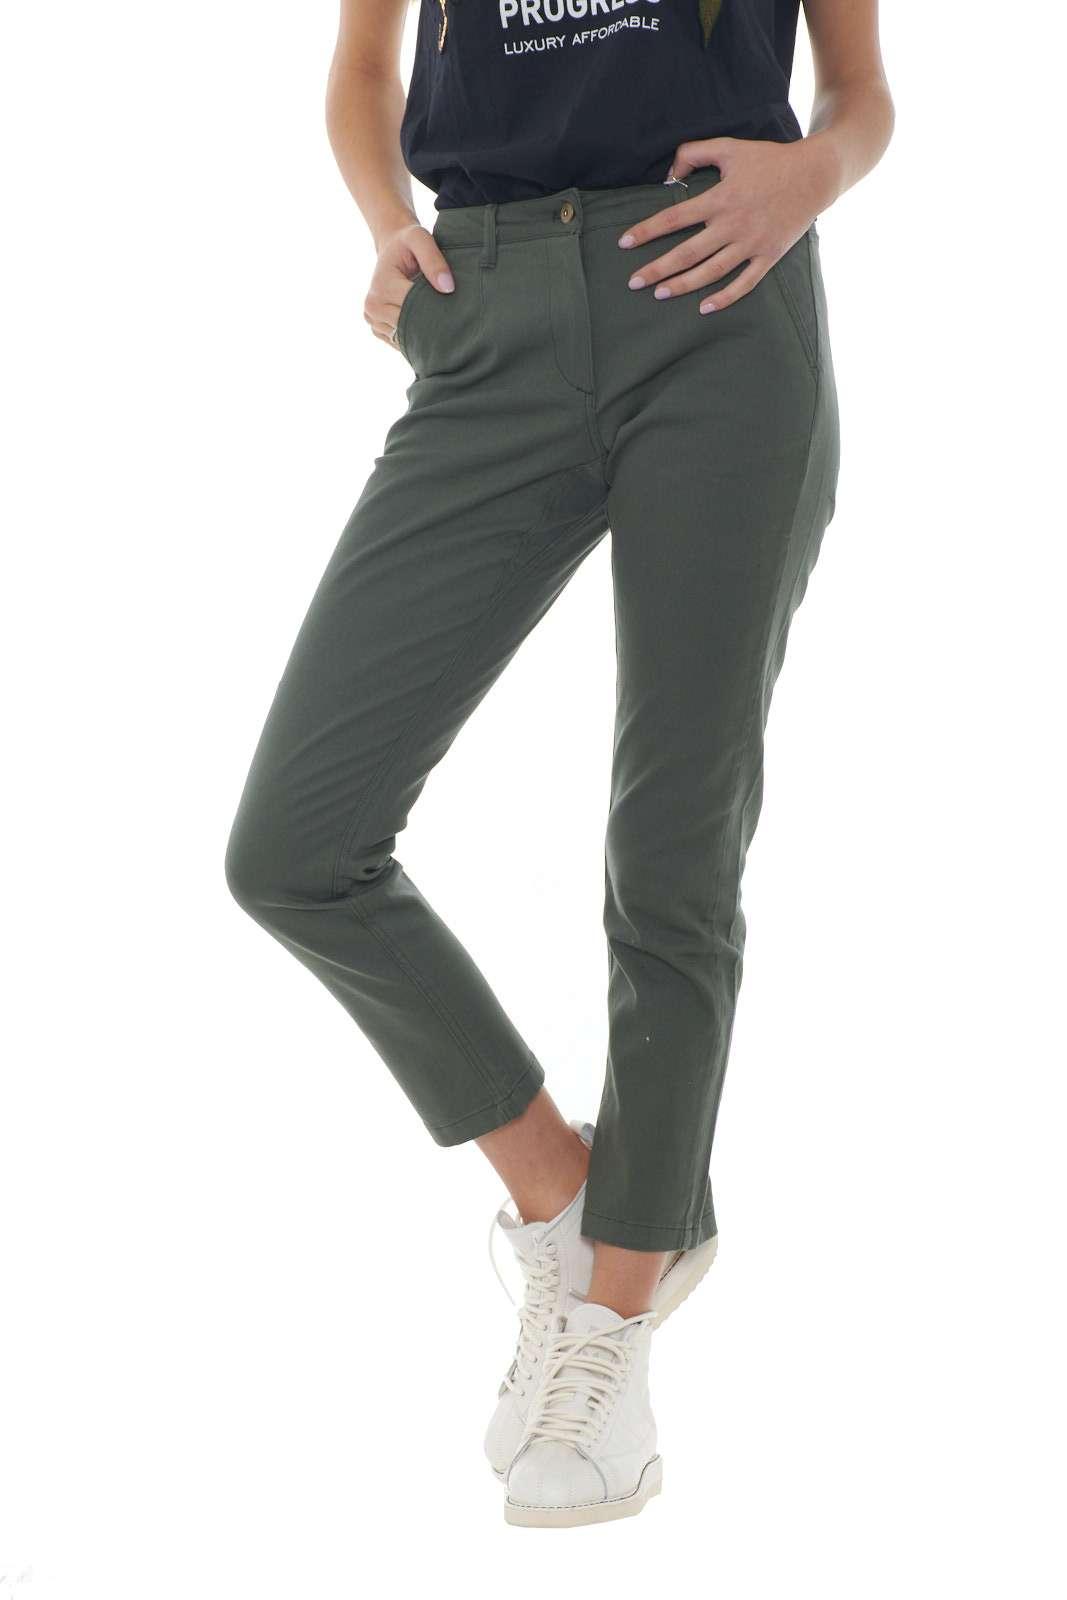 https://www.parmax.com/media/catalog/product/a/i/AI-outlet_parmax-pantaloni-donna-SH-Collection-18102019-A.jpg